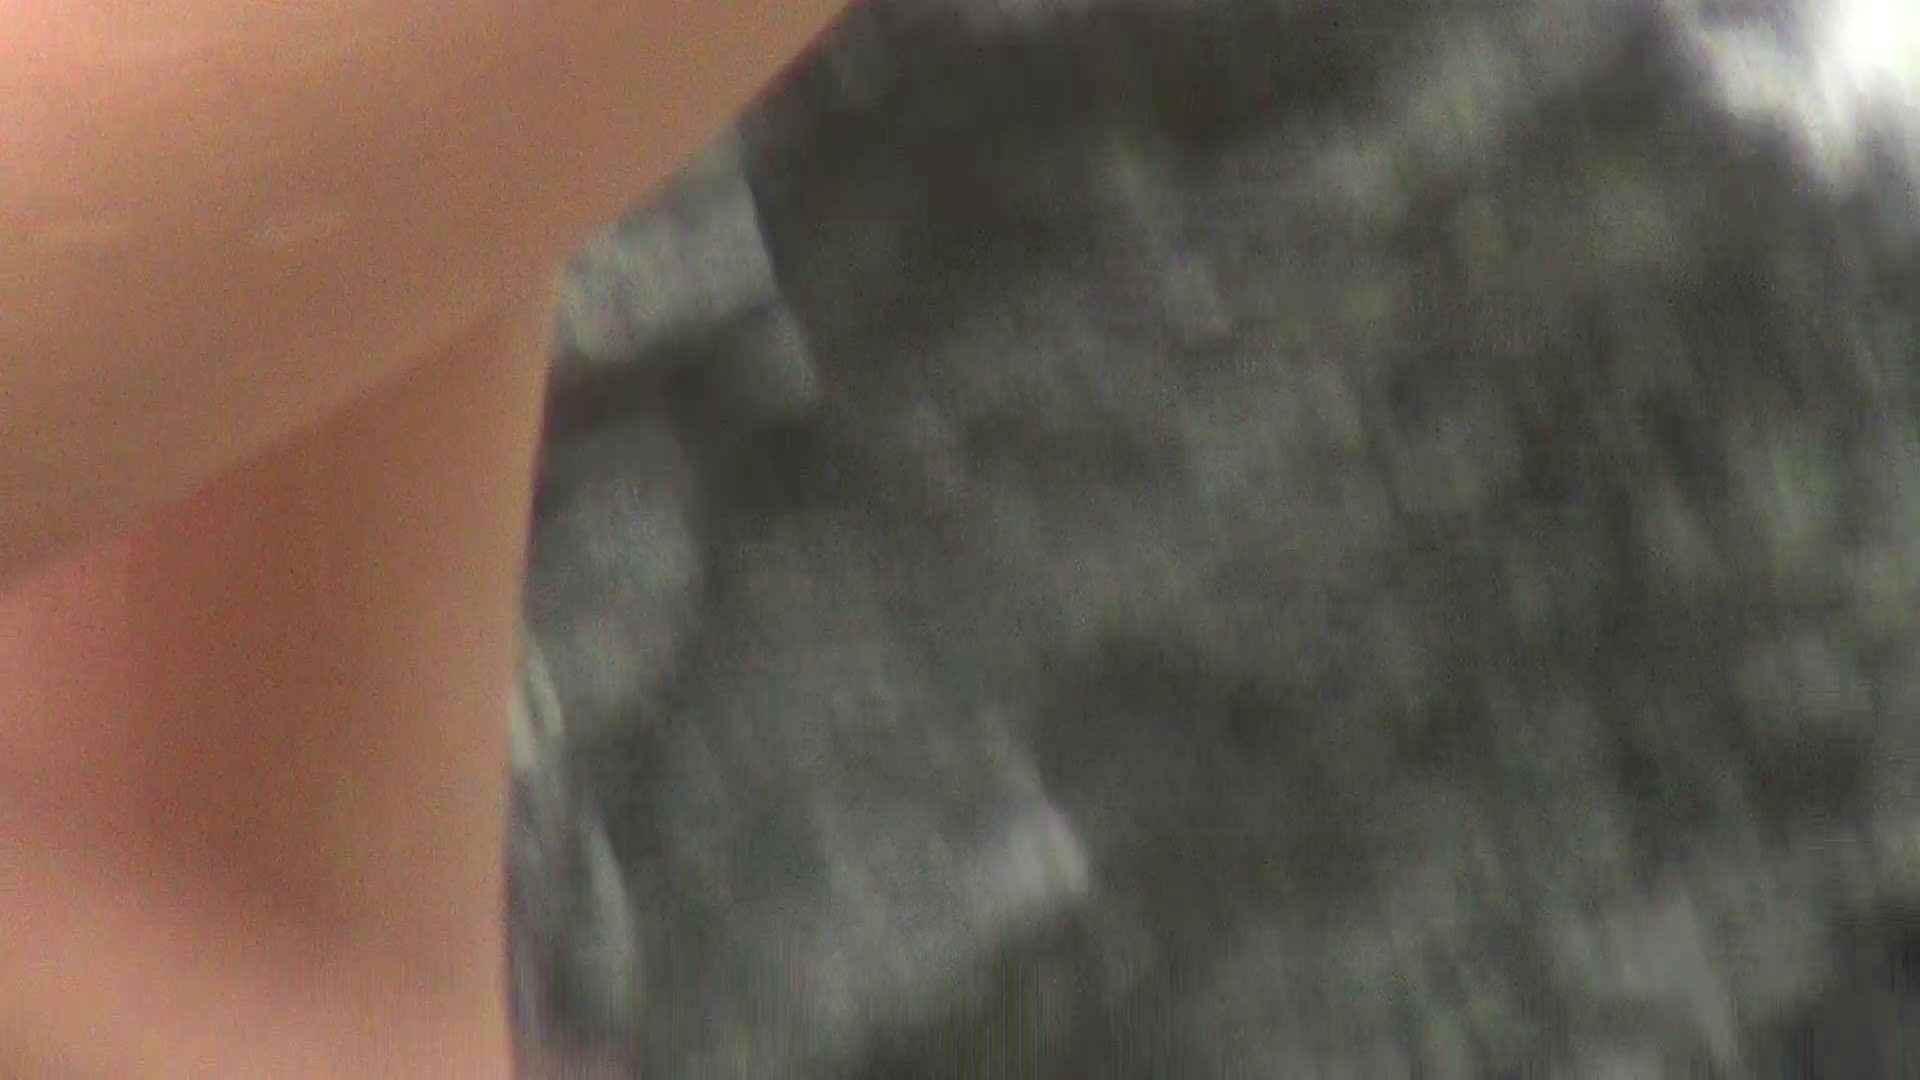 Vol.80 出産経験済みの弛んだ肉体と大胆すぎるアングル 露天覗き 濡れ場動画紹介 79枚 48